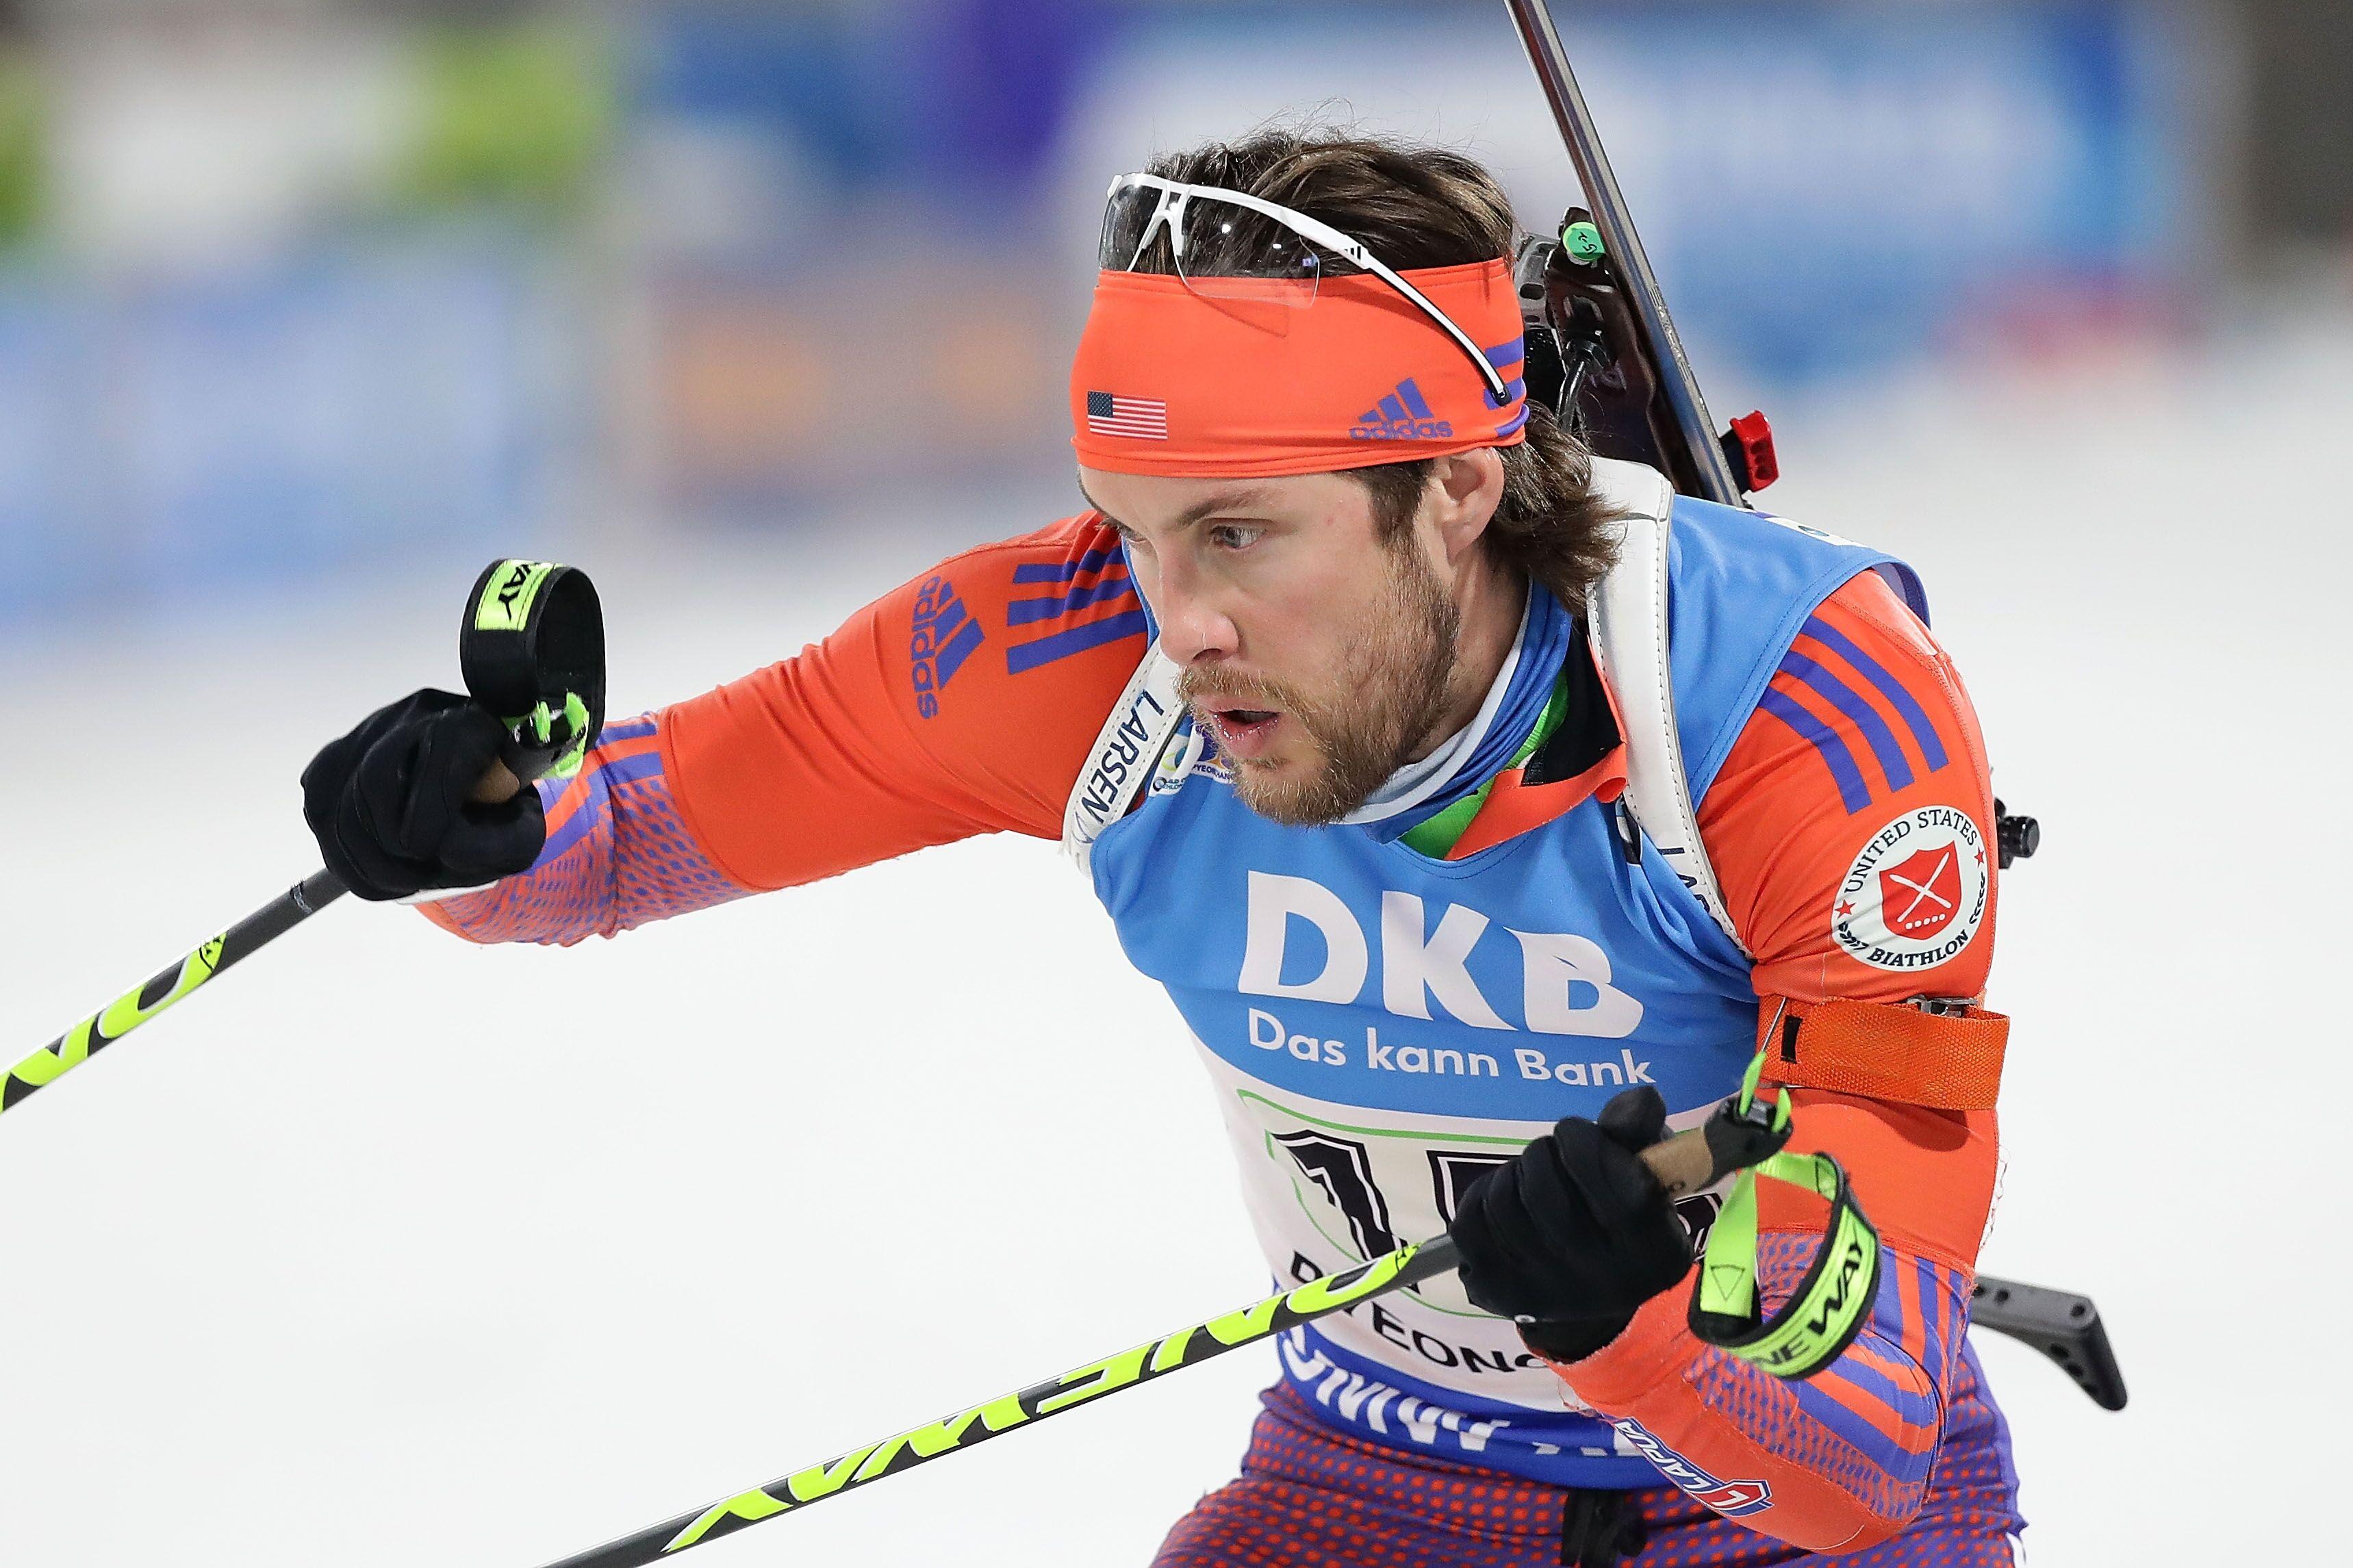 biathlon livestream